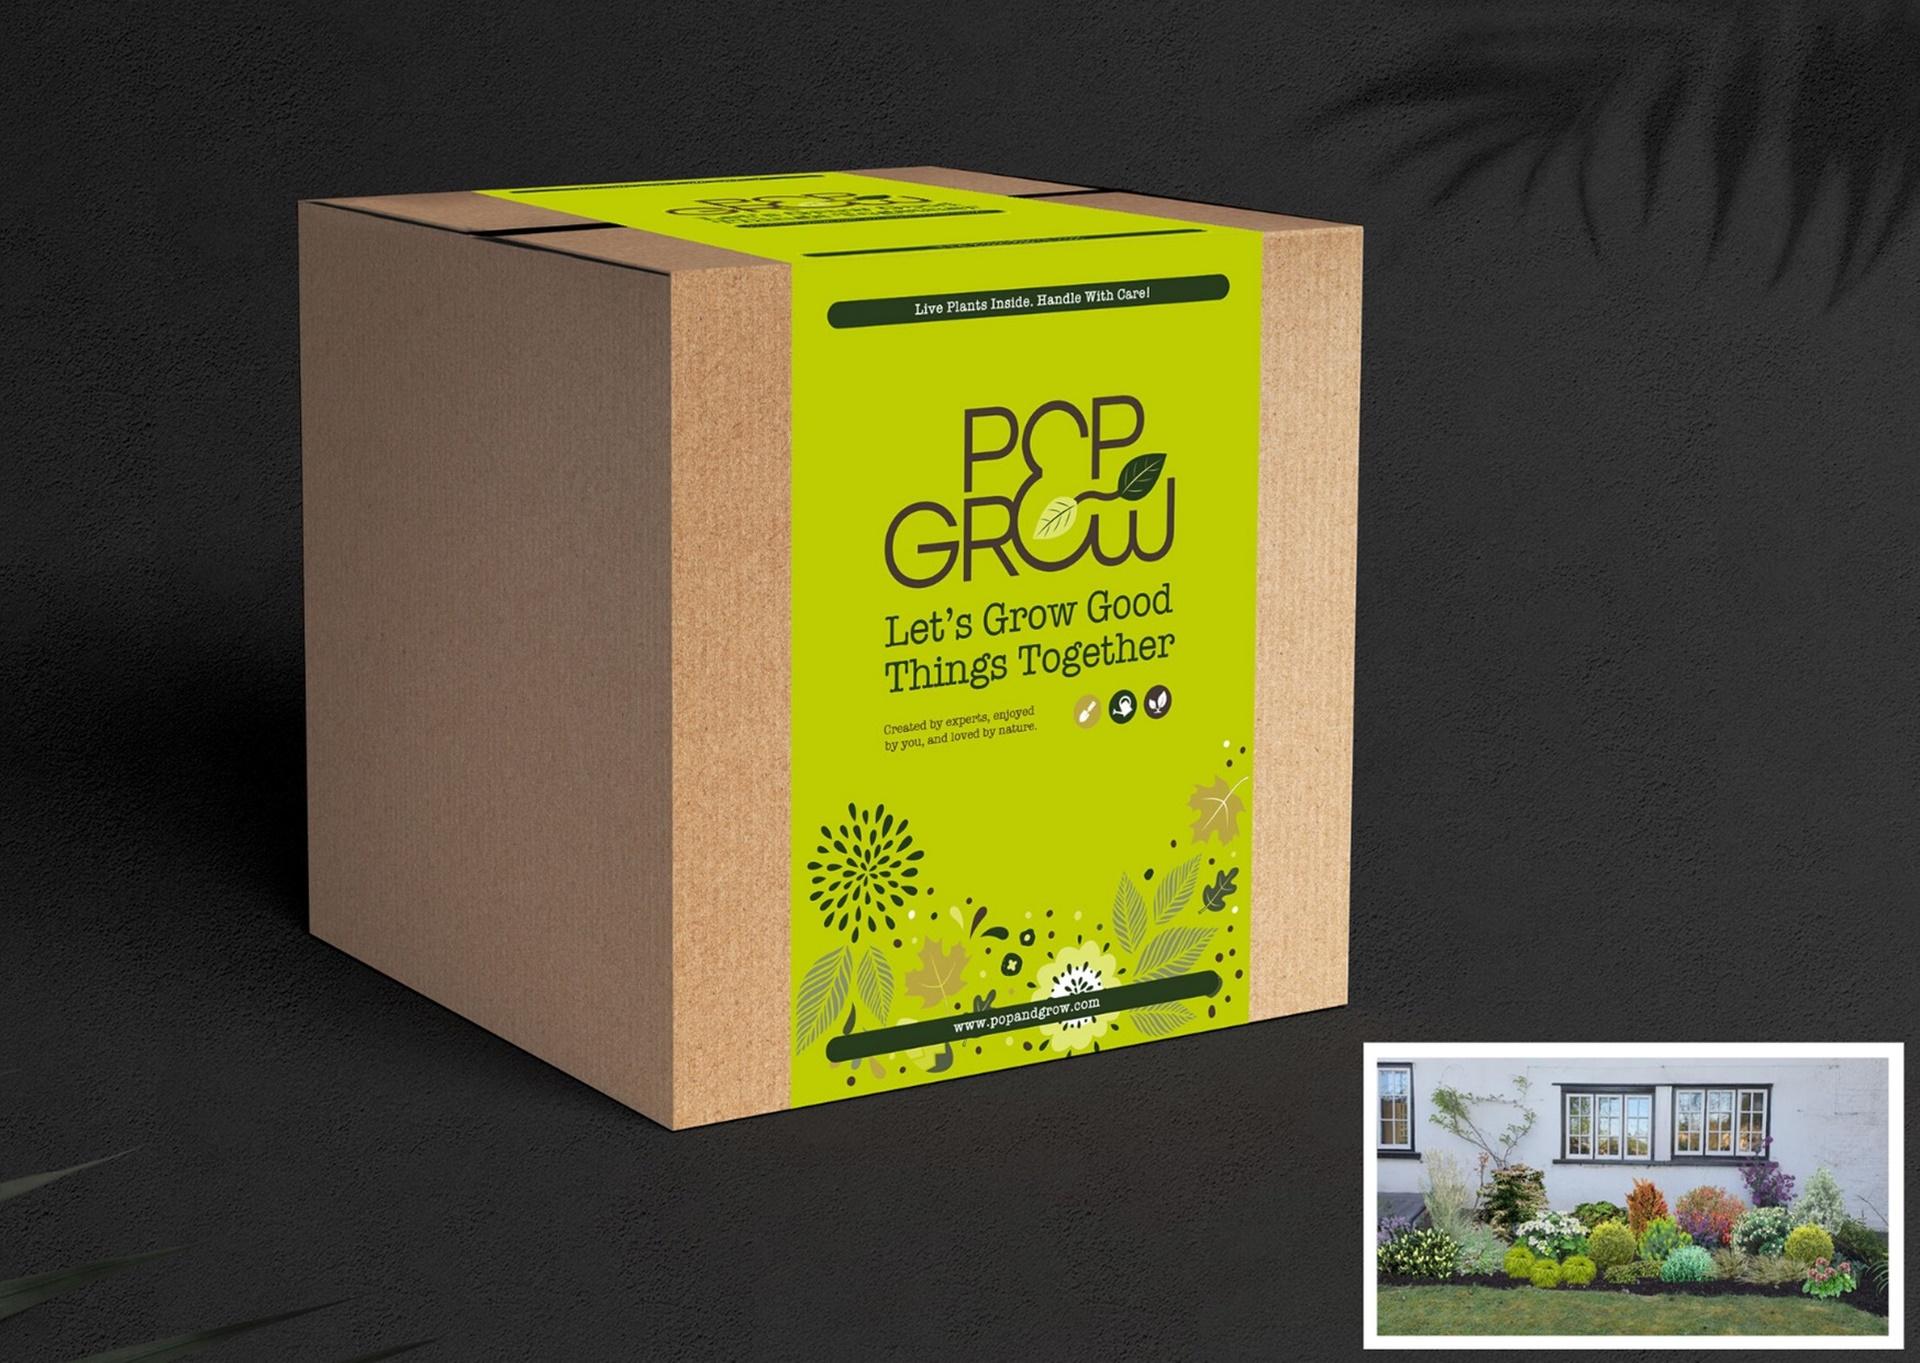 Pop and Grow garden in a box